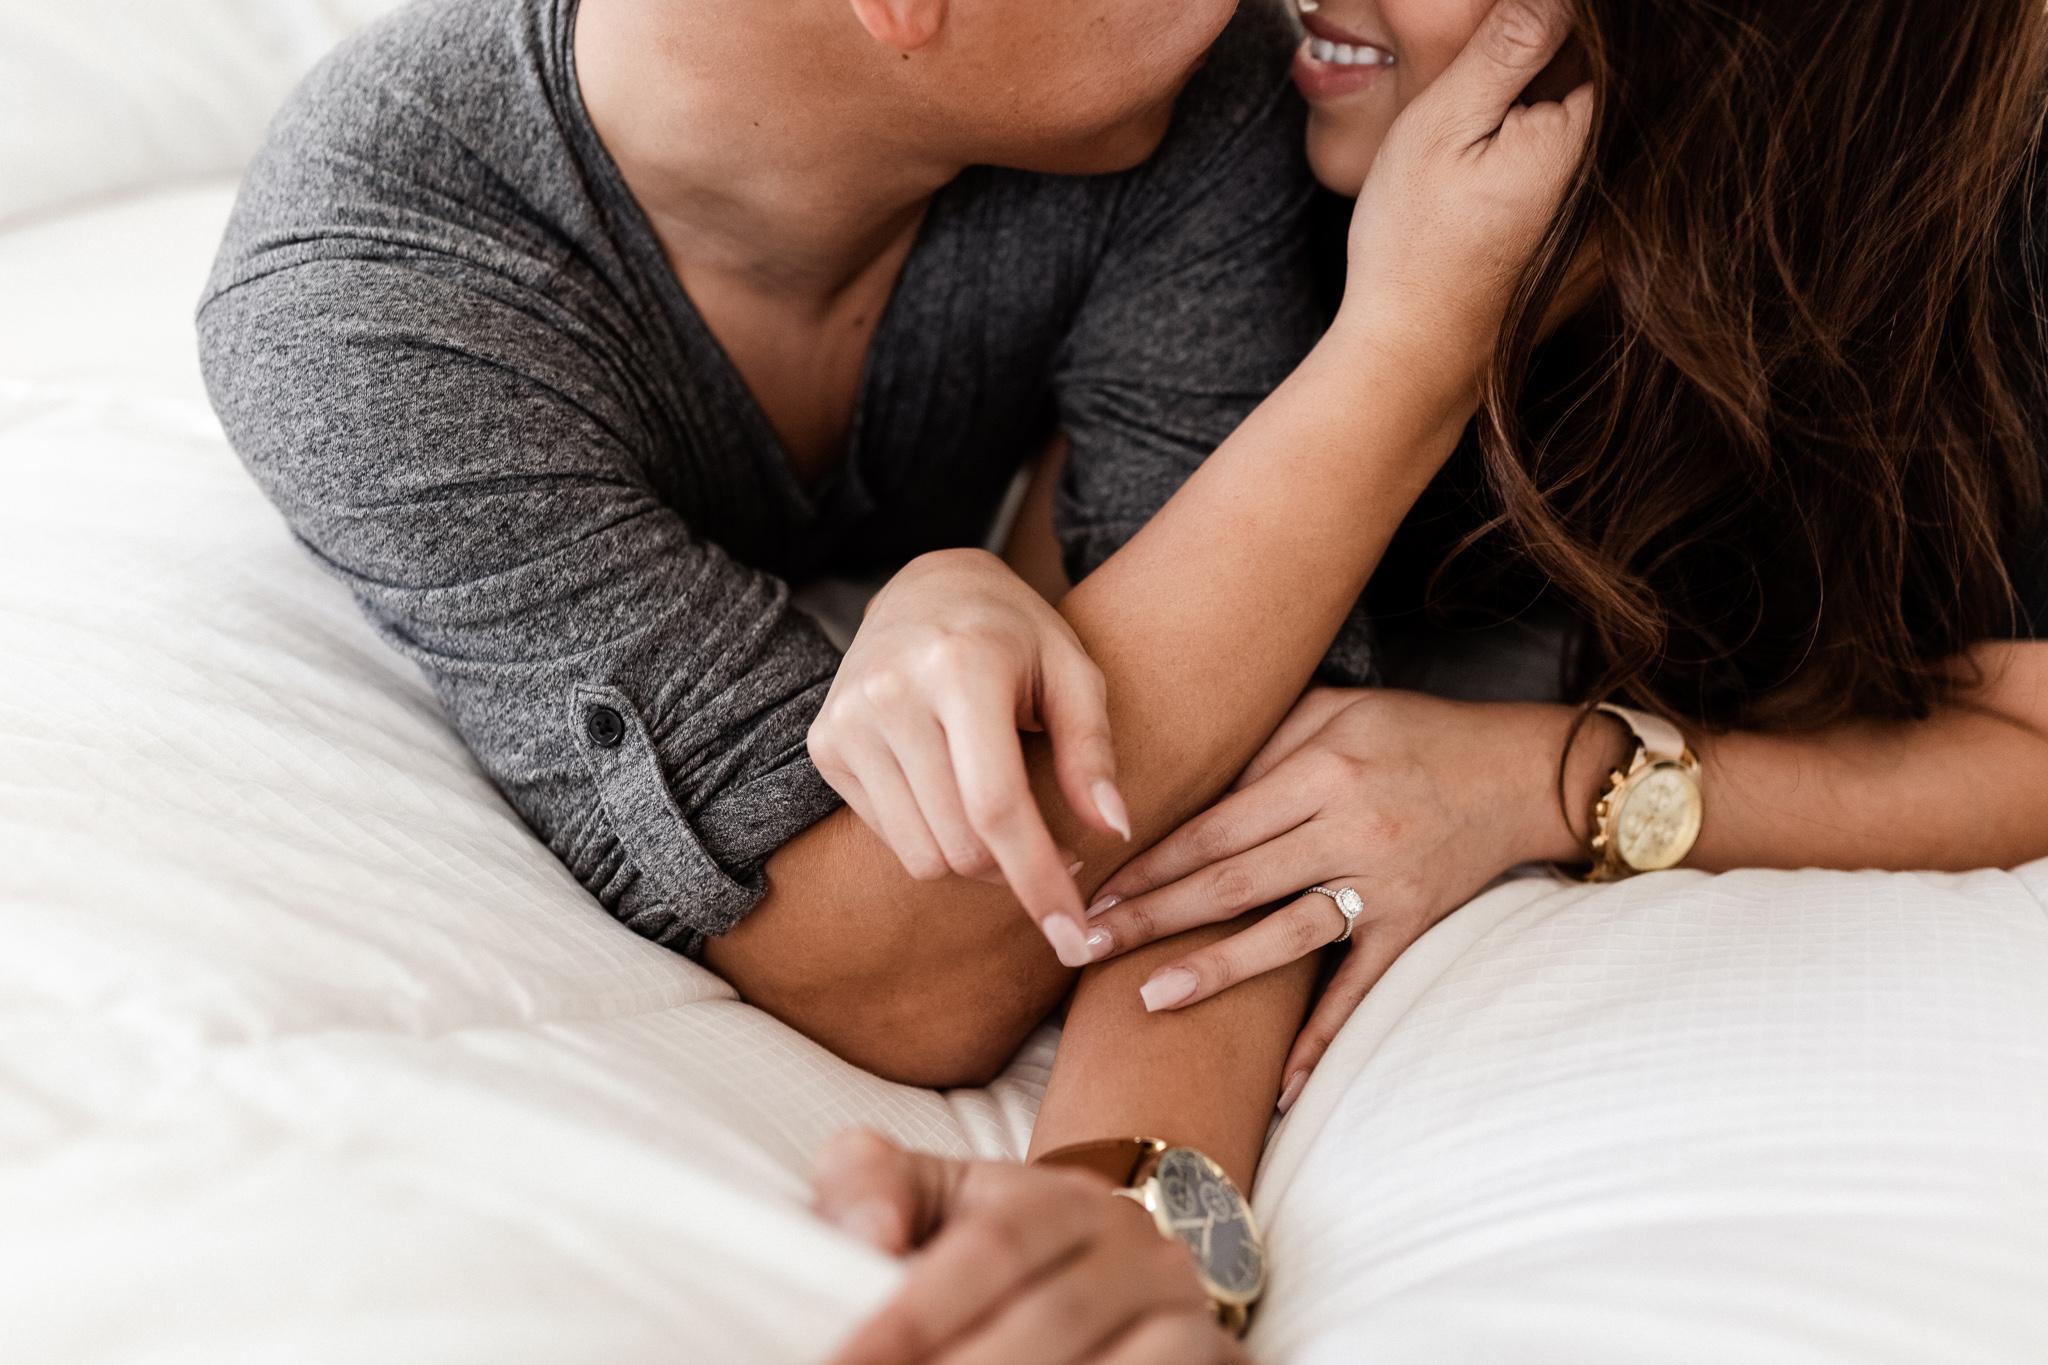 Hieu + Teresa | Colorful Romantic Downtown Engagements | Oklahoma Wedding Photographer-19.jpg